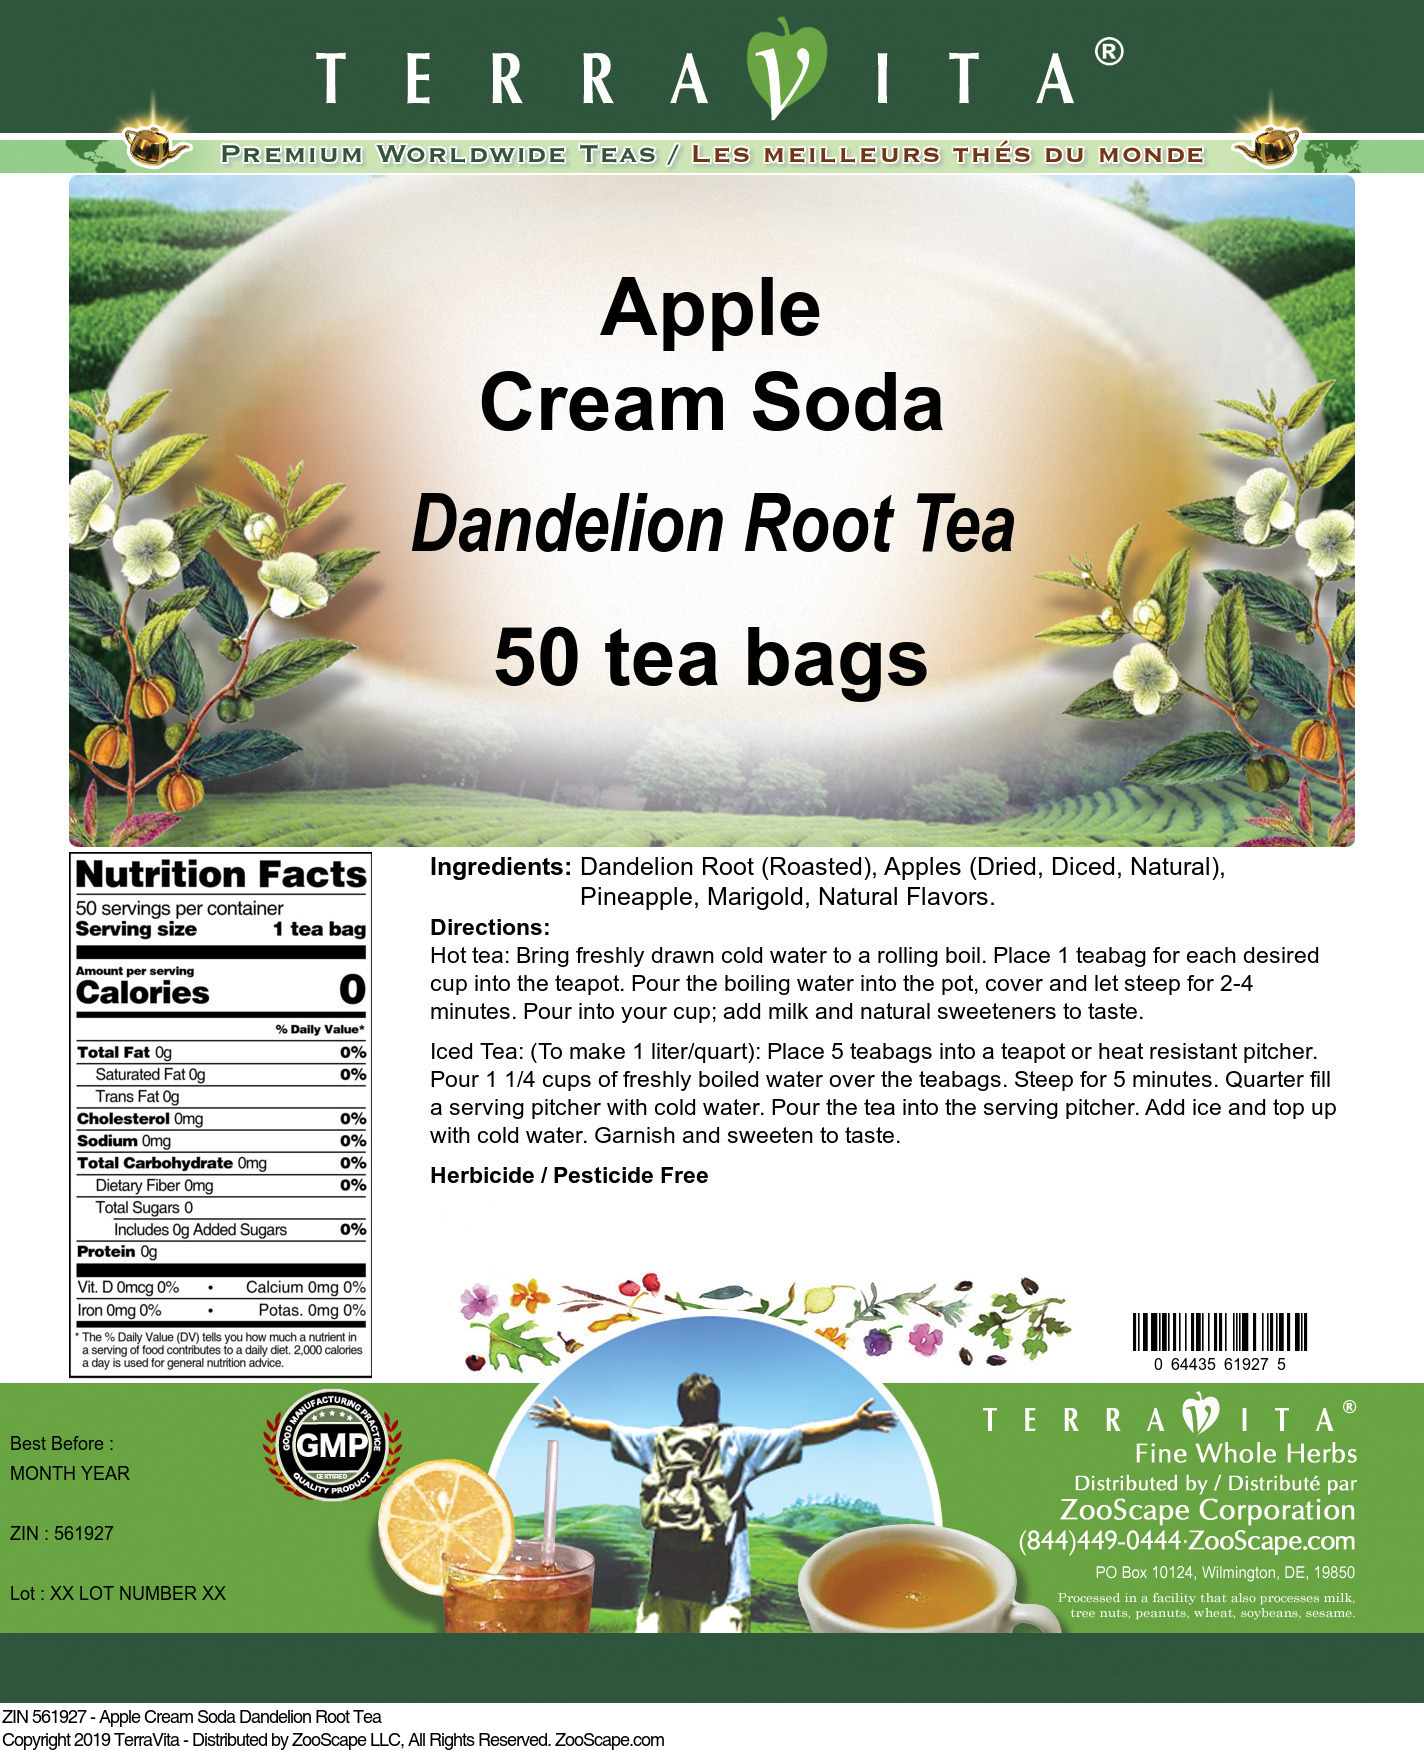 Apple Cream Soda Dandelion Root Tea